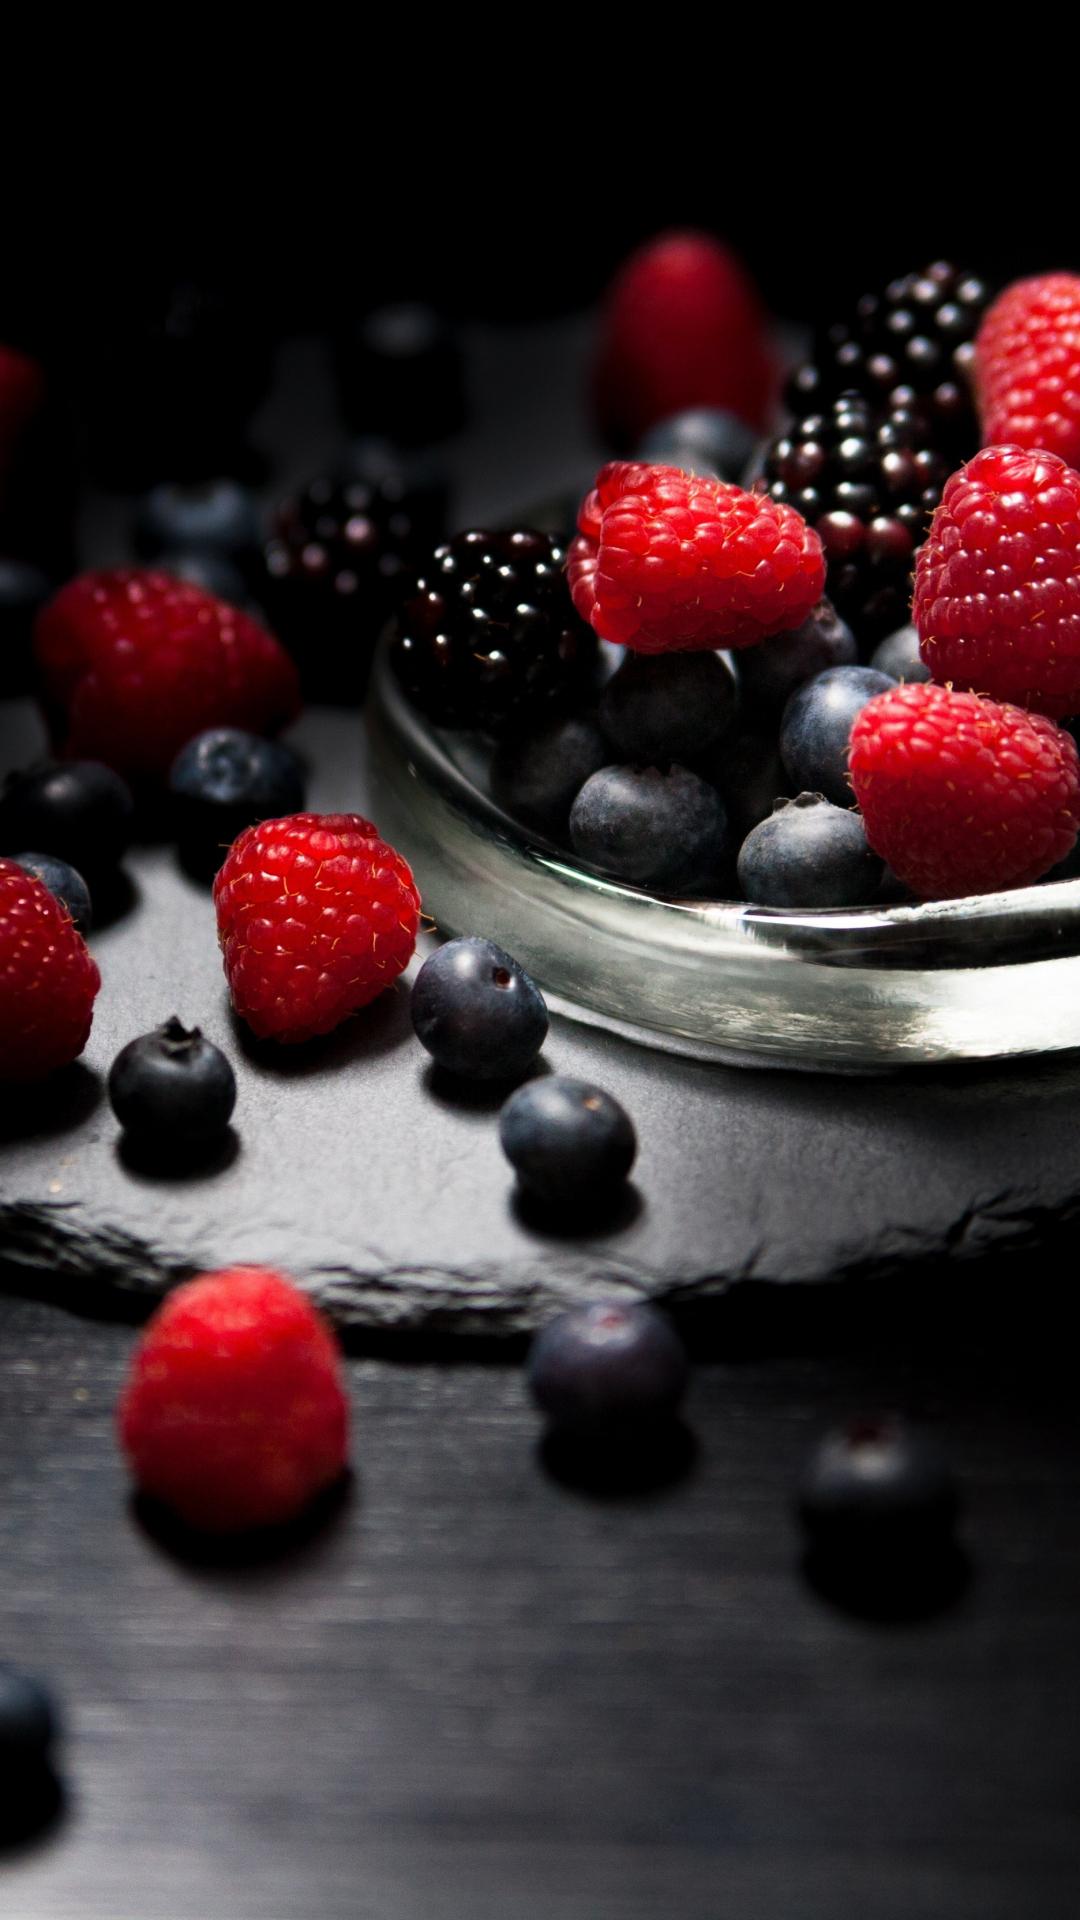 Dark mood, food, fruits, Raspberry, blueberry, Blackberry, 1080x1920 wallpaper